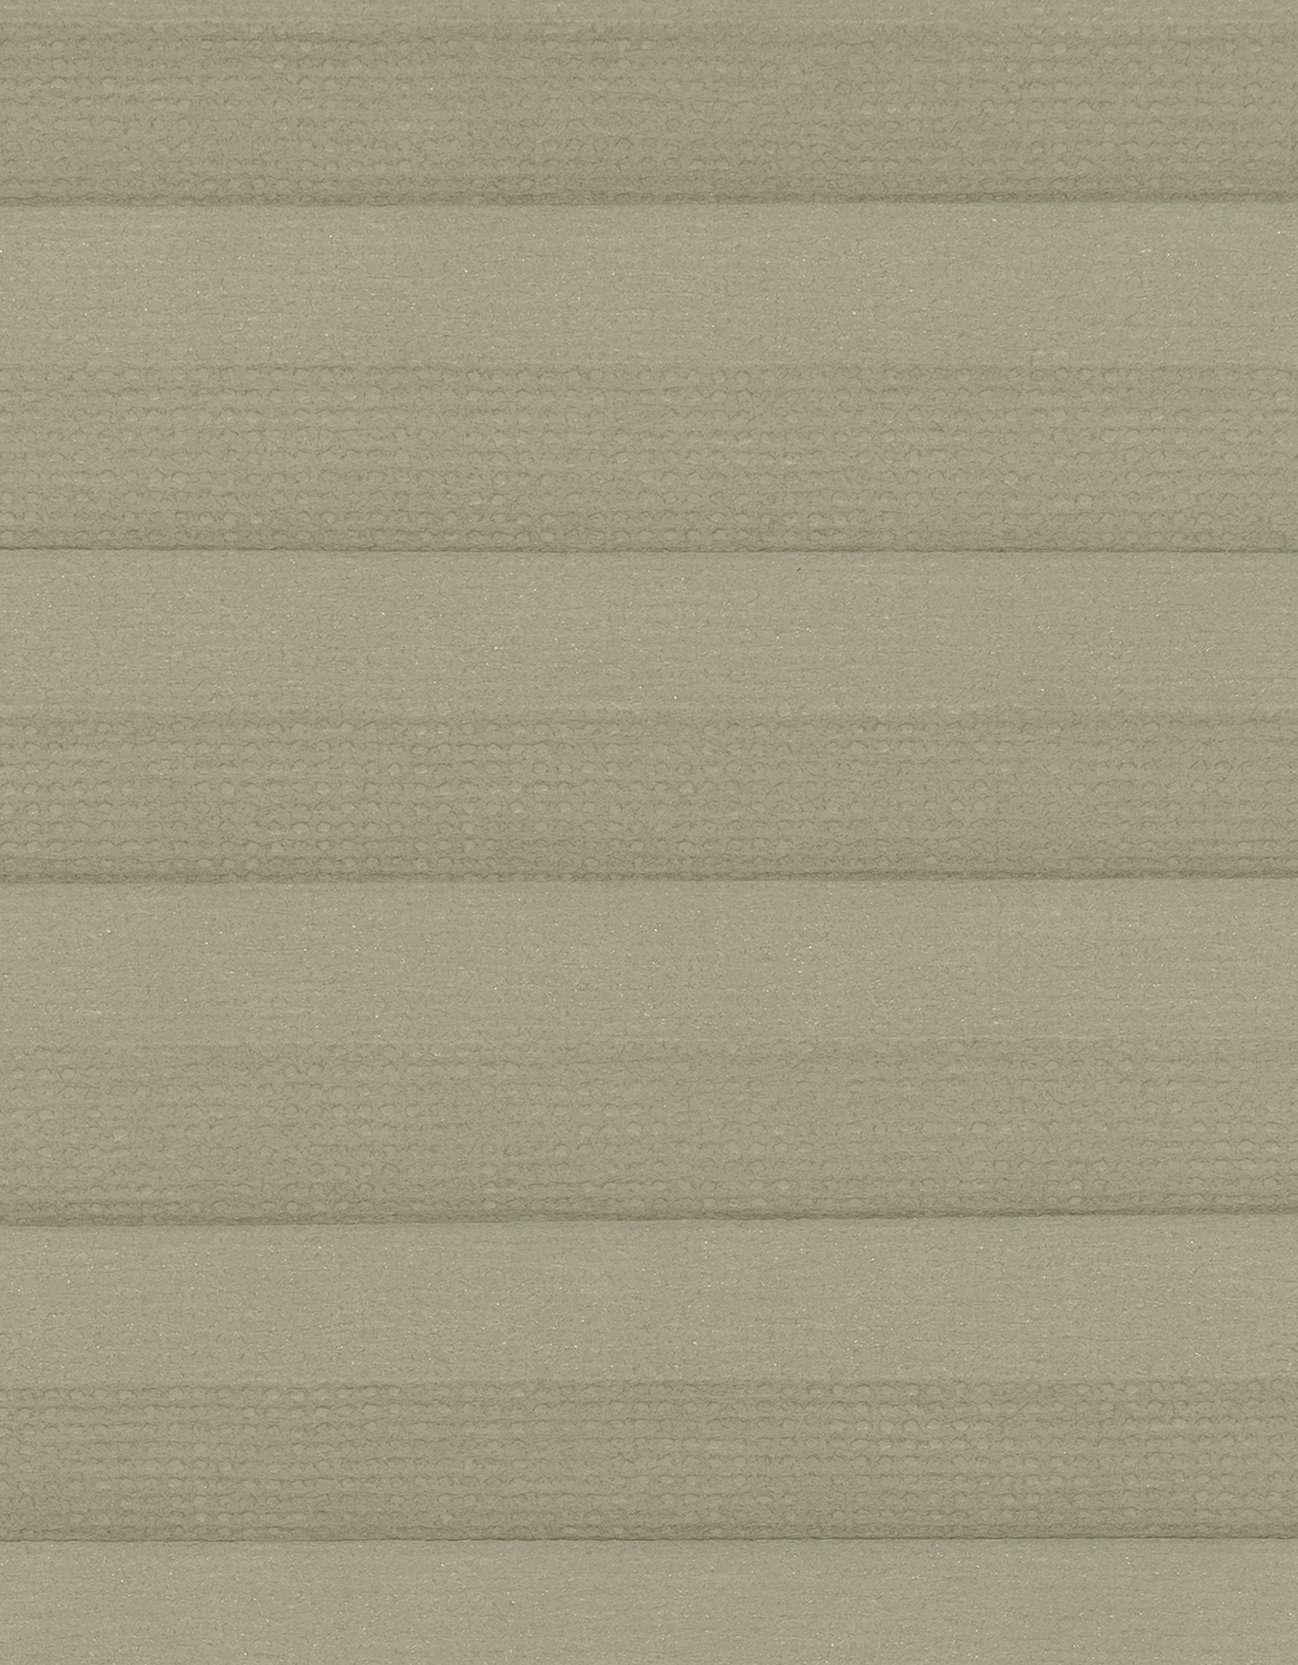 Semi-transparant Dupligordijnen 25 mm Kleurstaal Khaki